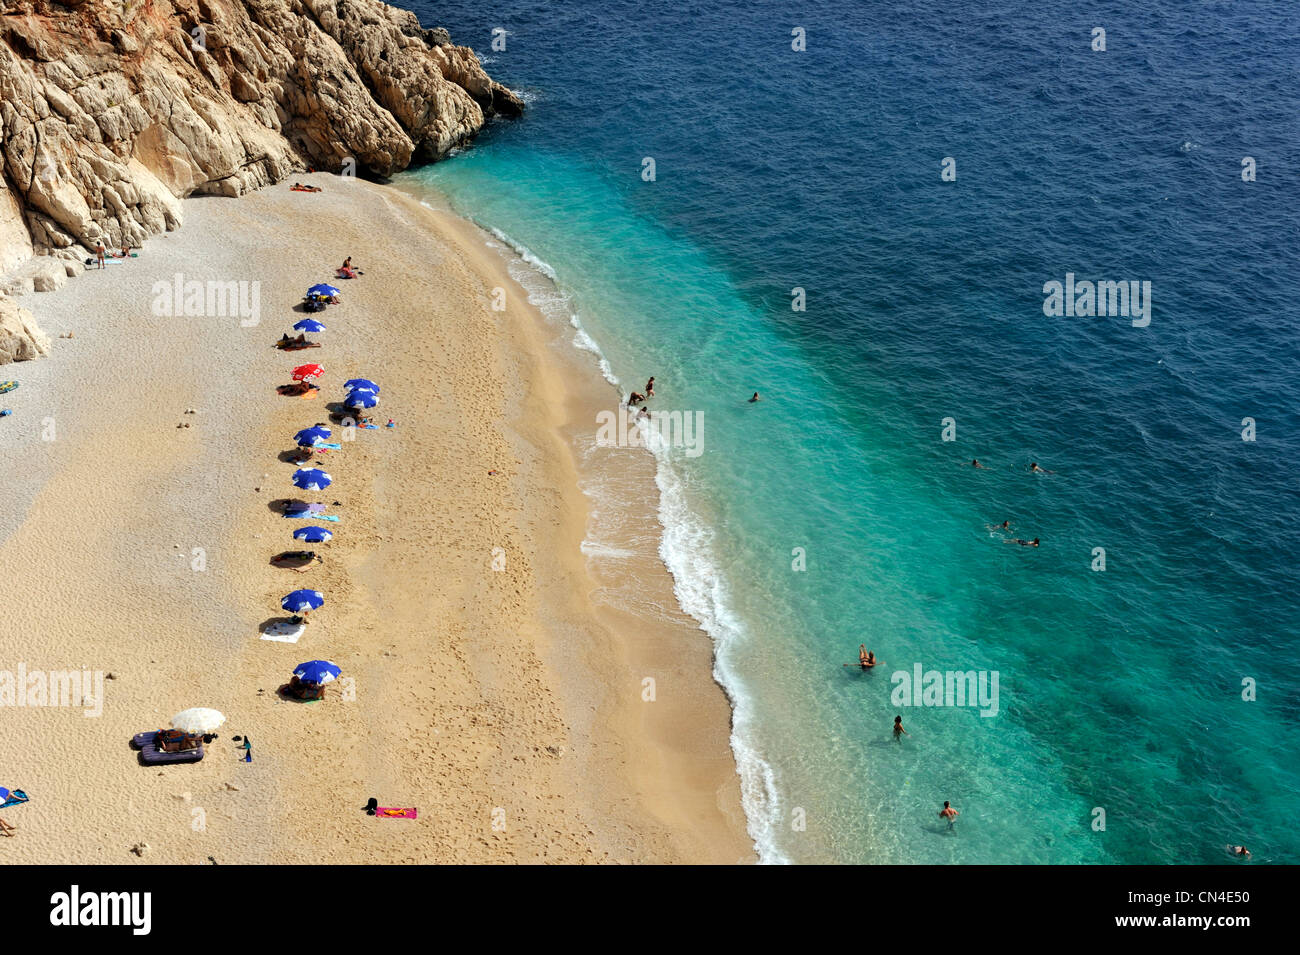 Turkey, Mediterranean Region, Turquoise Coast, Kaputas beach near Kalkan - Stock Image